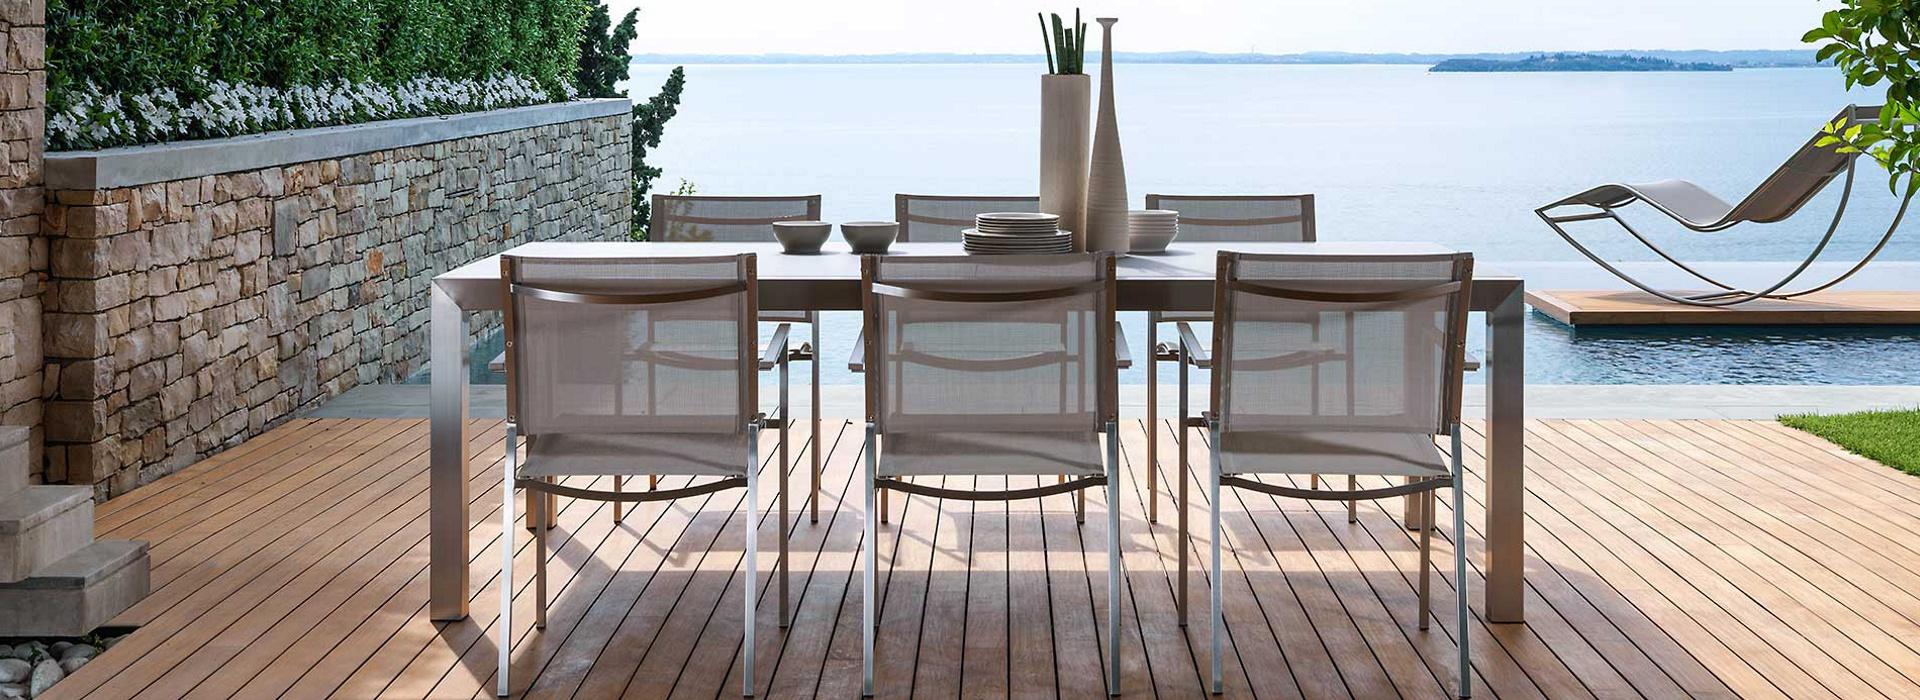 Vivereverde arredi per esterni 3d arredo giardino for Volantino mobili da giardino